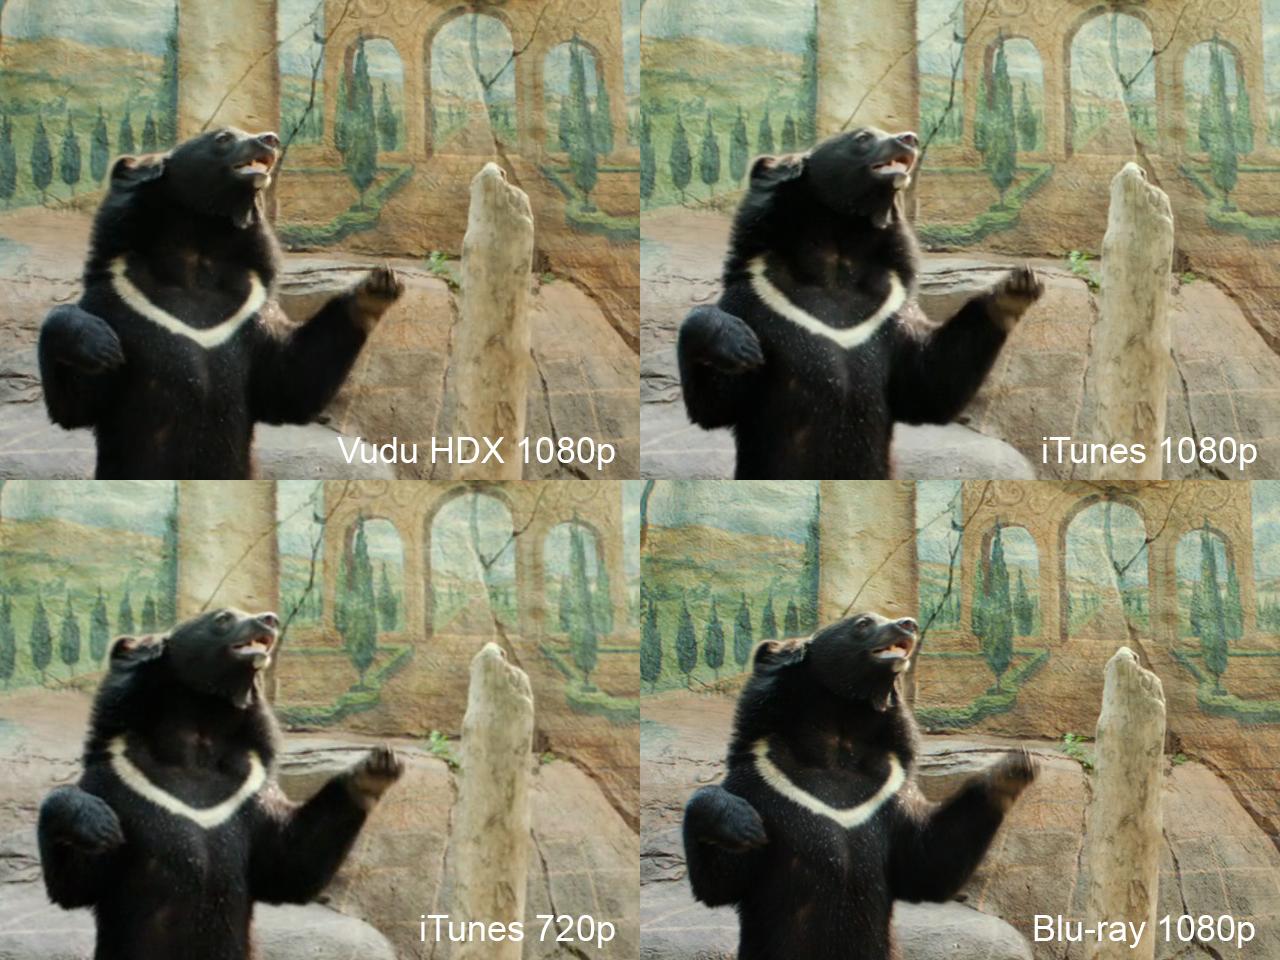 Life of Pi: iTunes vs  Vudu vs  Blu-ray (updated) - AVS